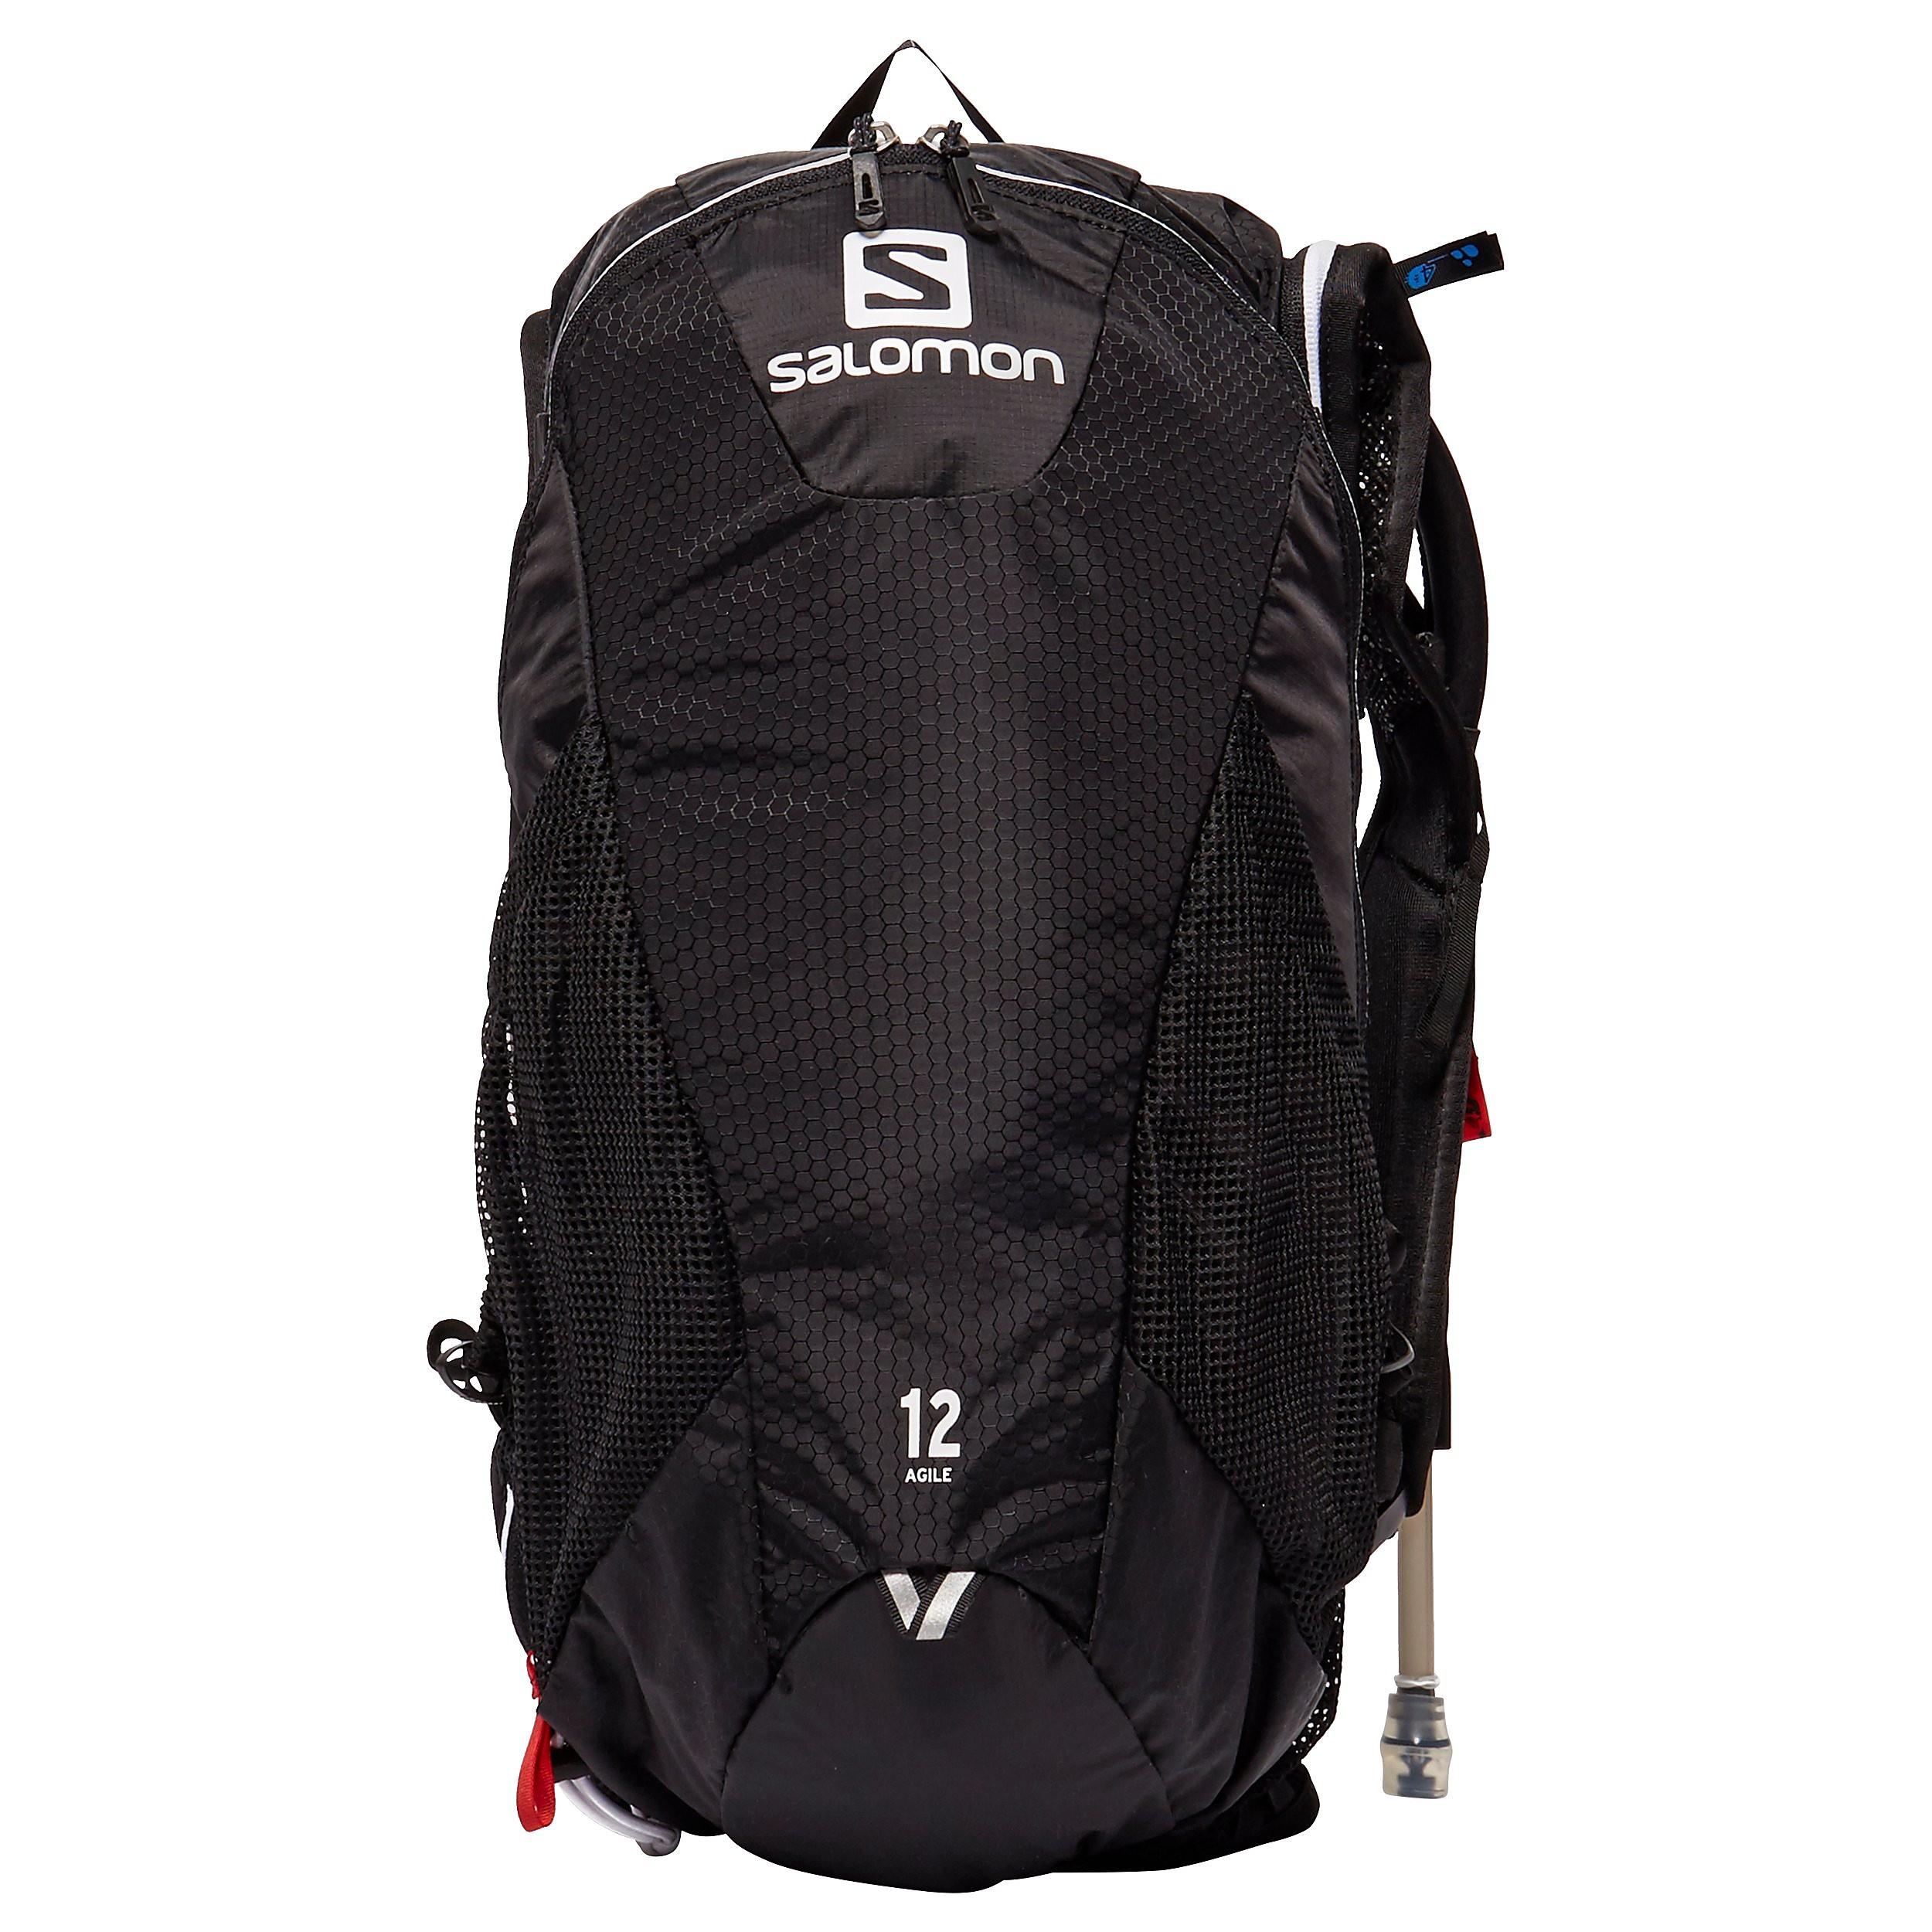 Salomon Unisex 12L Capacity Running Backpack